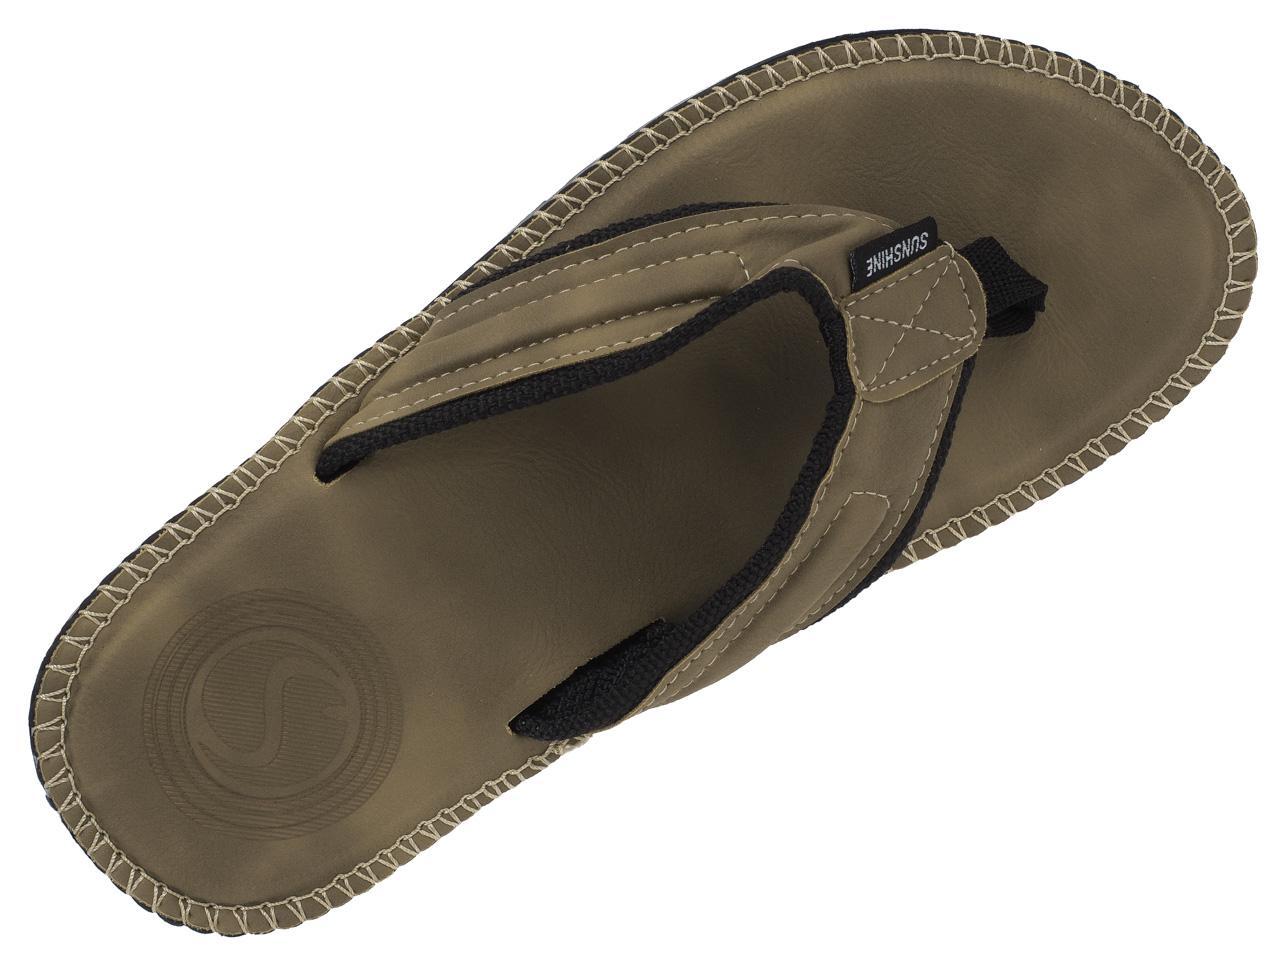 Flip-Flops-Tap-Dance-Shoes-Treeker9-Barbados-Beige-Flip-Flop-H-Beige-77481-New thumbnail 3